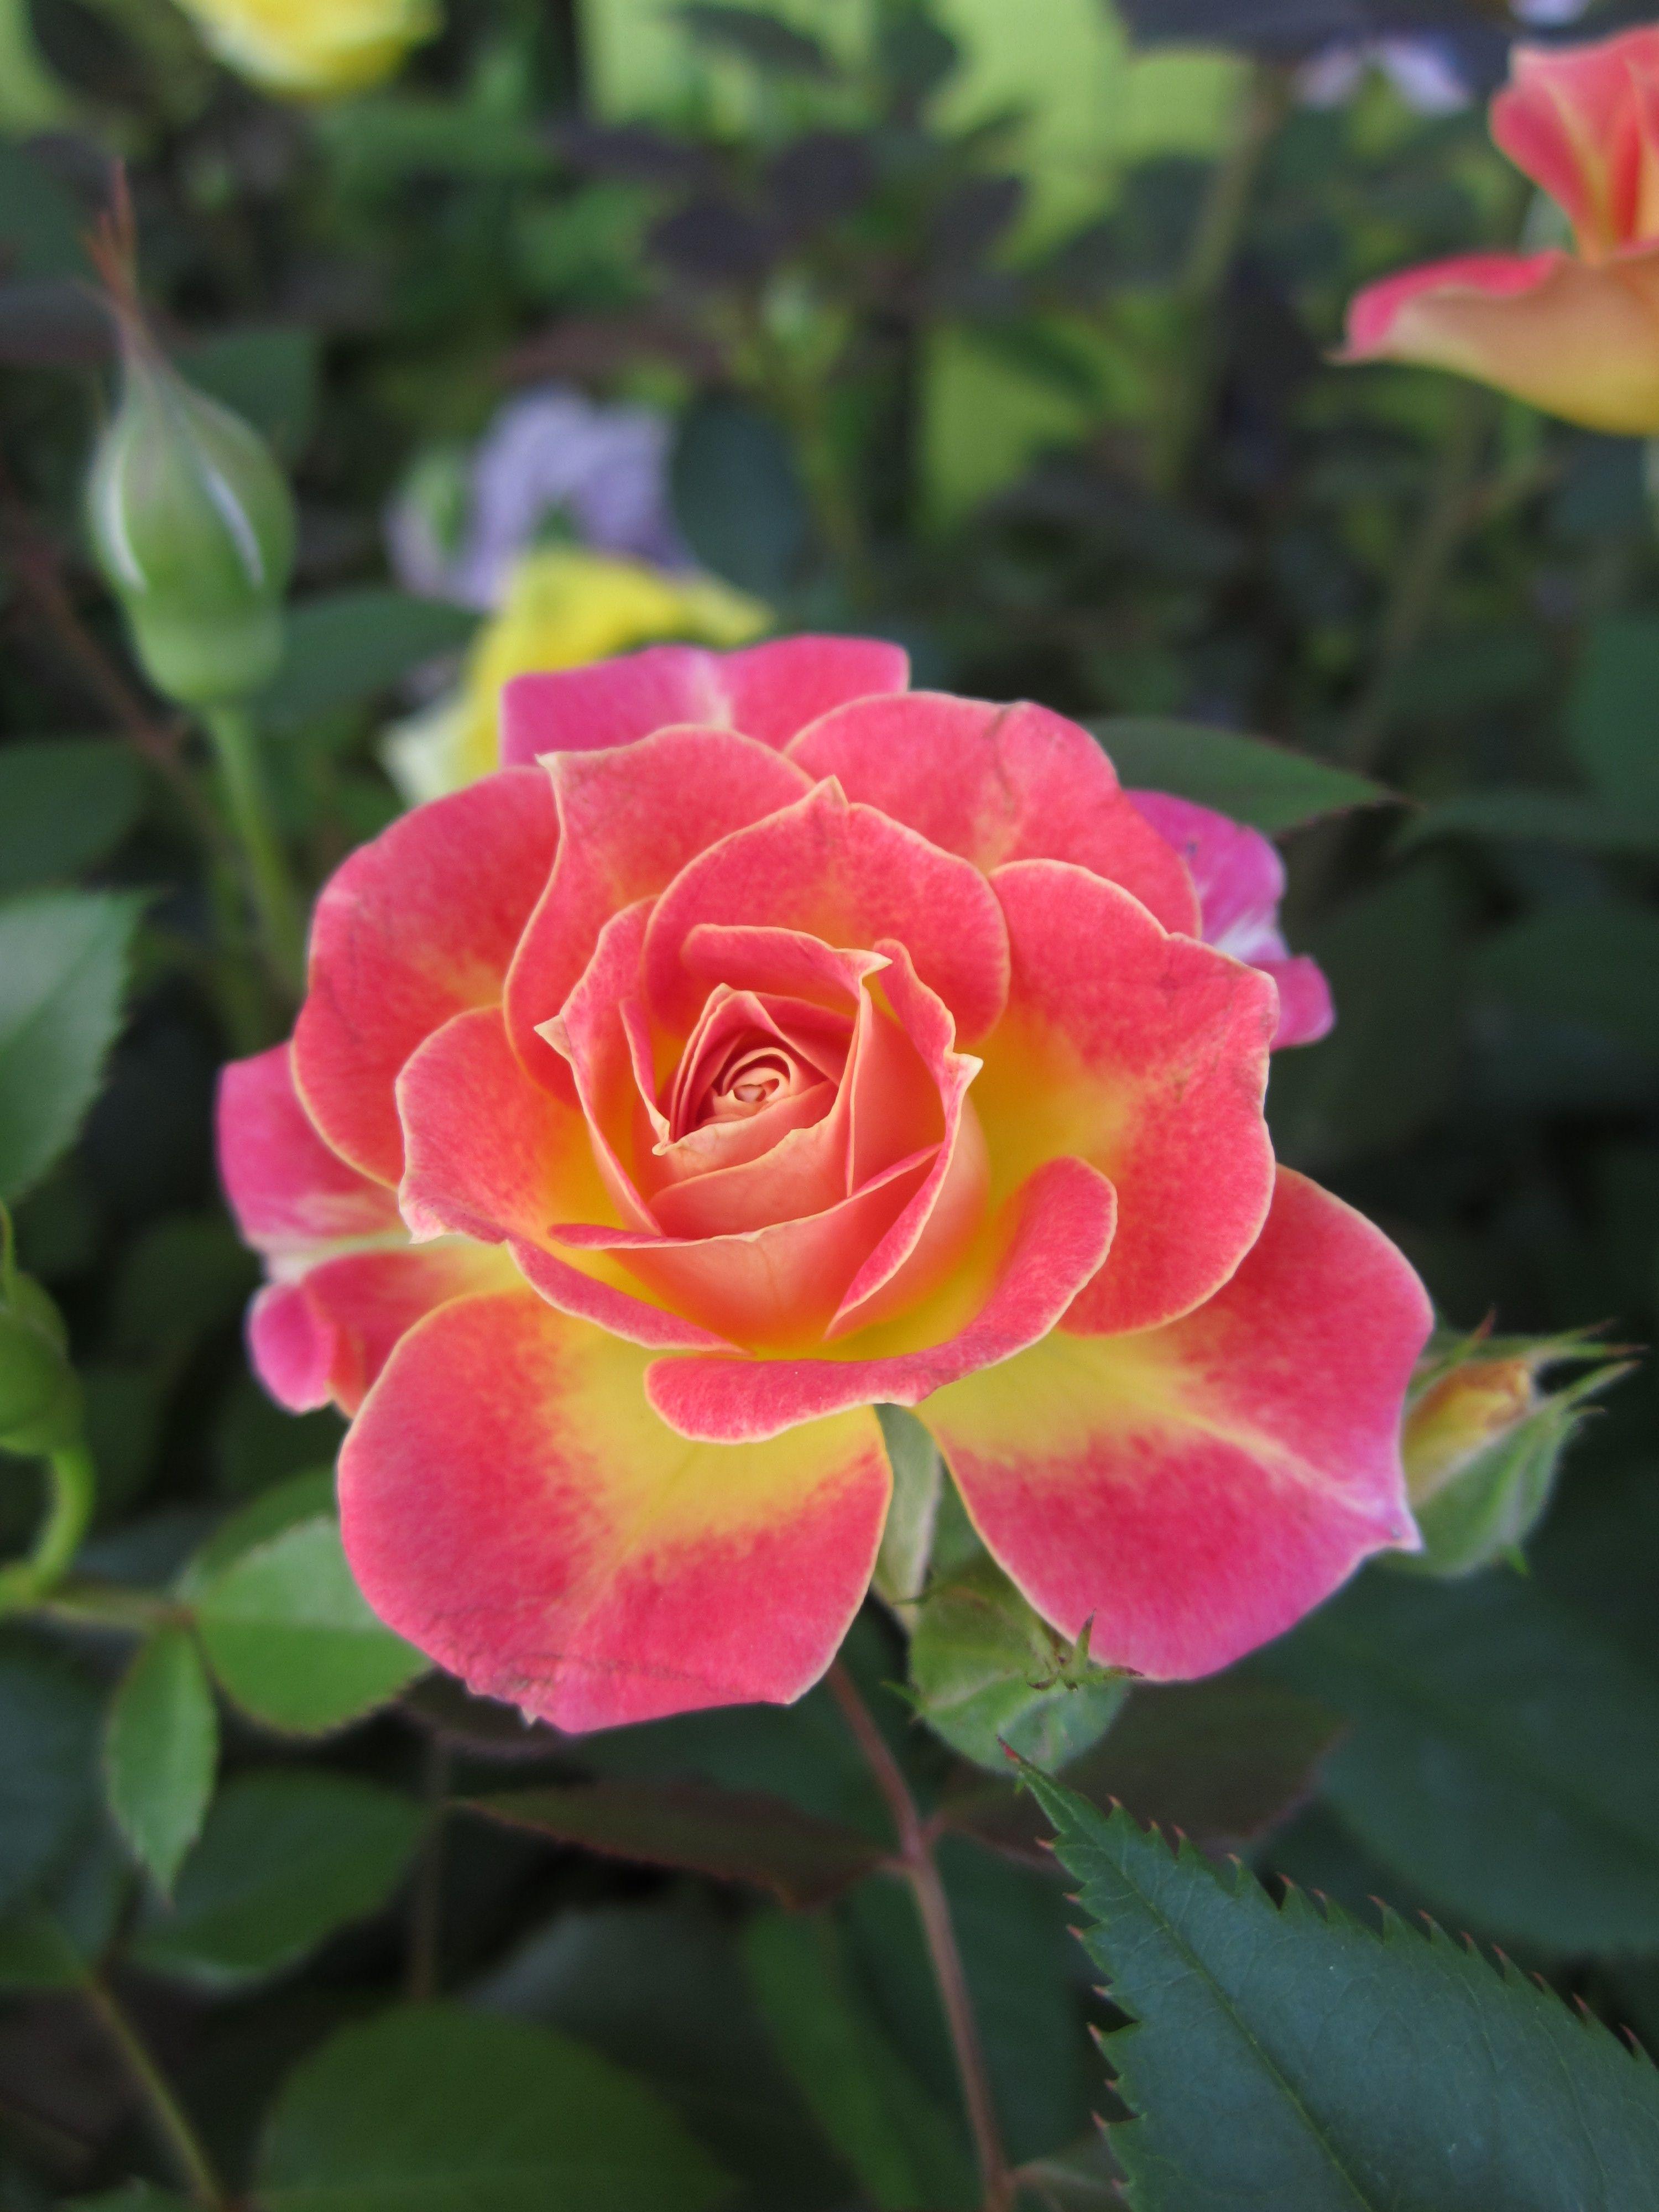 Mini roses enjoy the beauty of miniature roses all summer long mini roses enjoy the beauty of miniature roses all summer long izmirmasajfo